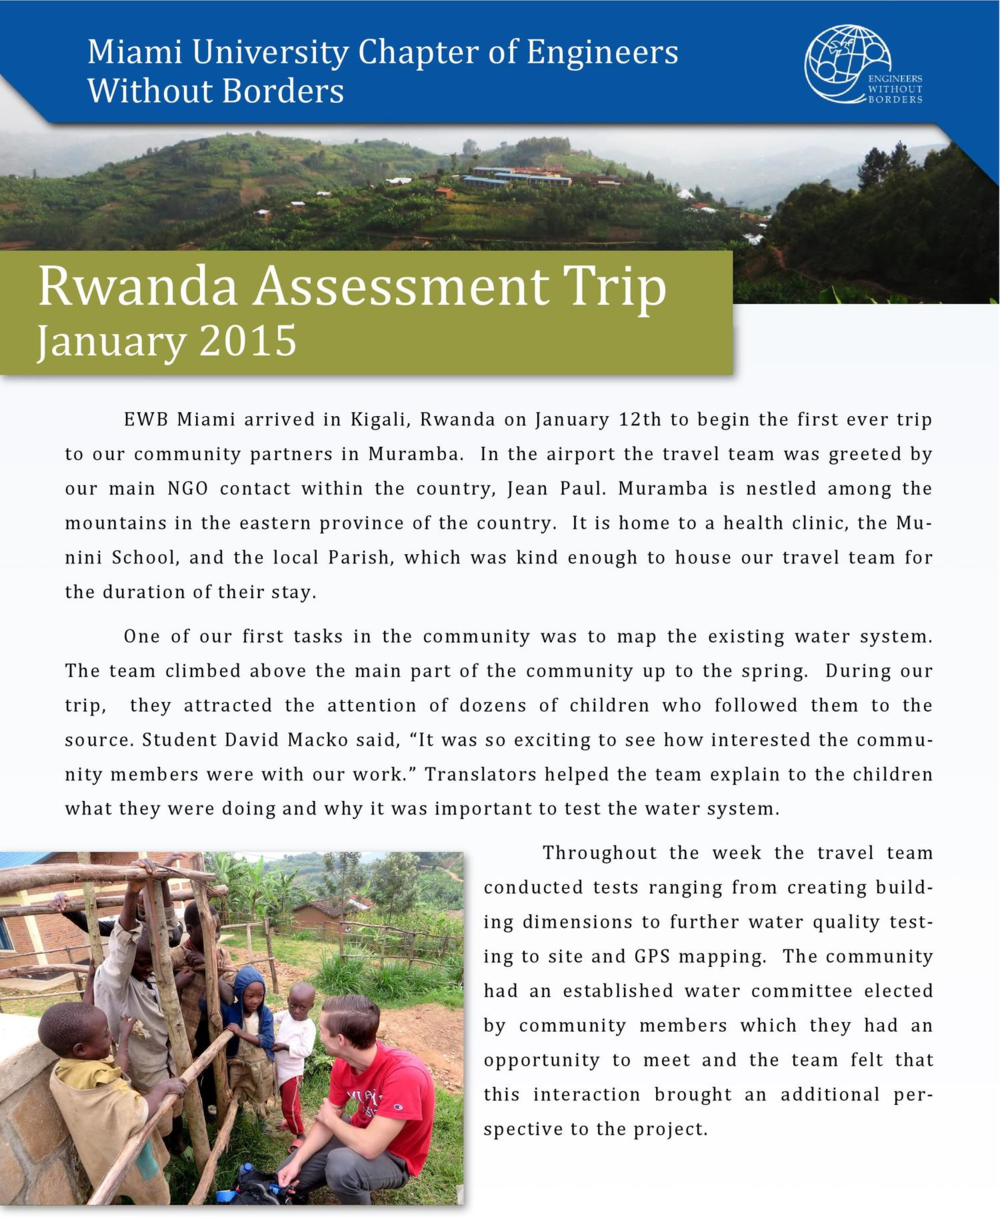 Rwanda Newsletter-page1.jpg